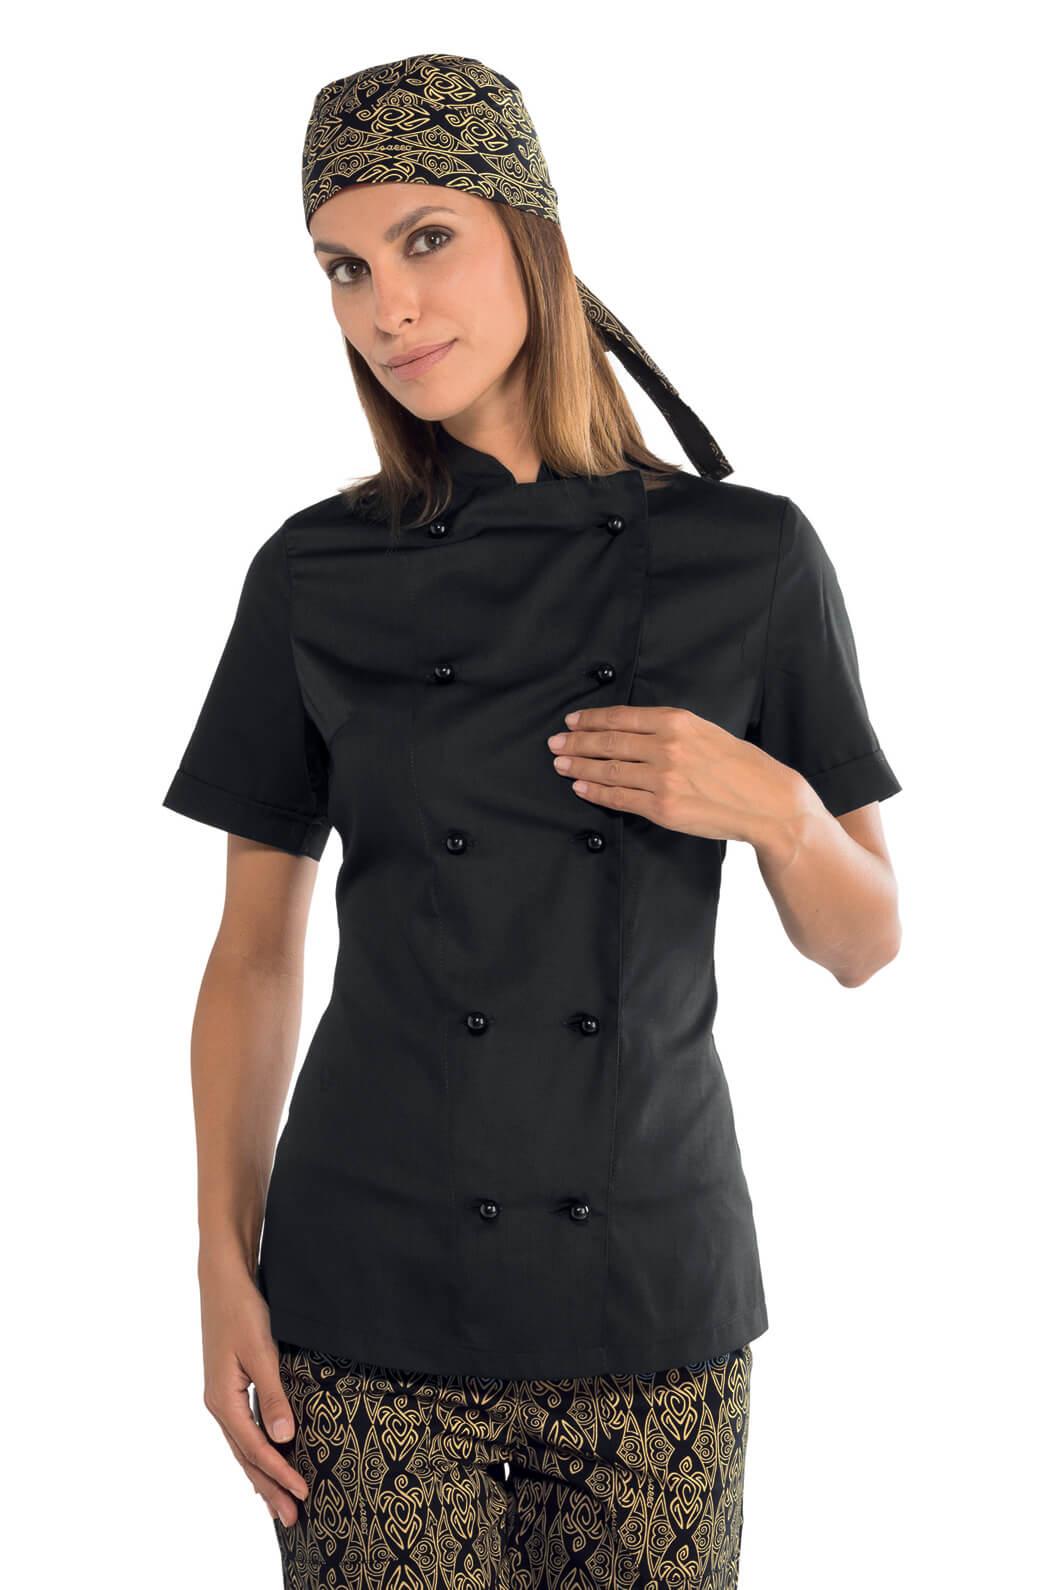 veste cuisine noire pour femme tissu extra l ger vestes. Black Bedroom Furniture Sets. Home Design Ideas